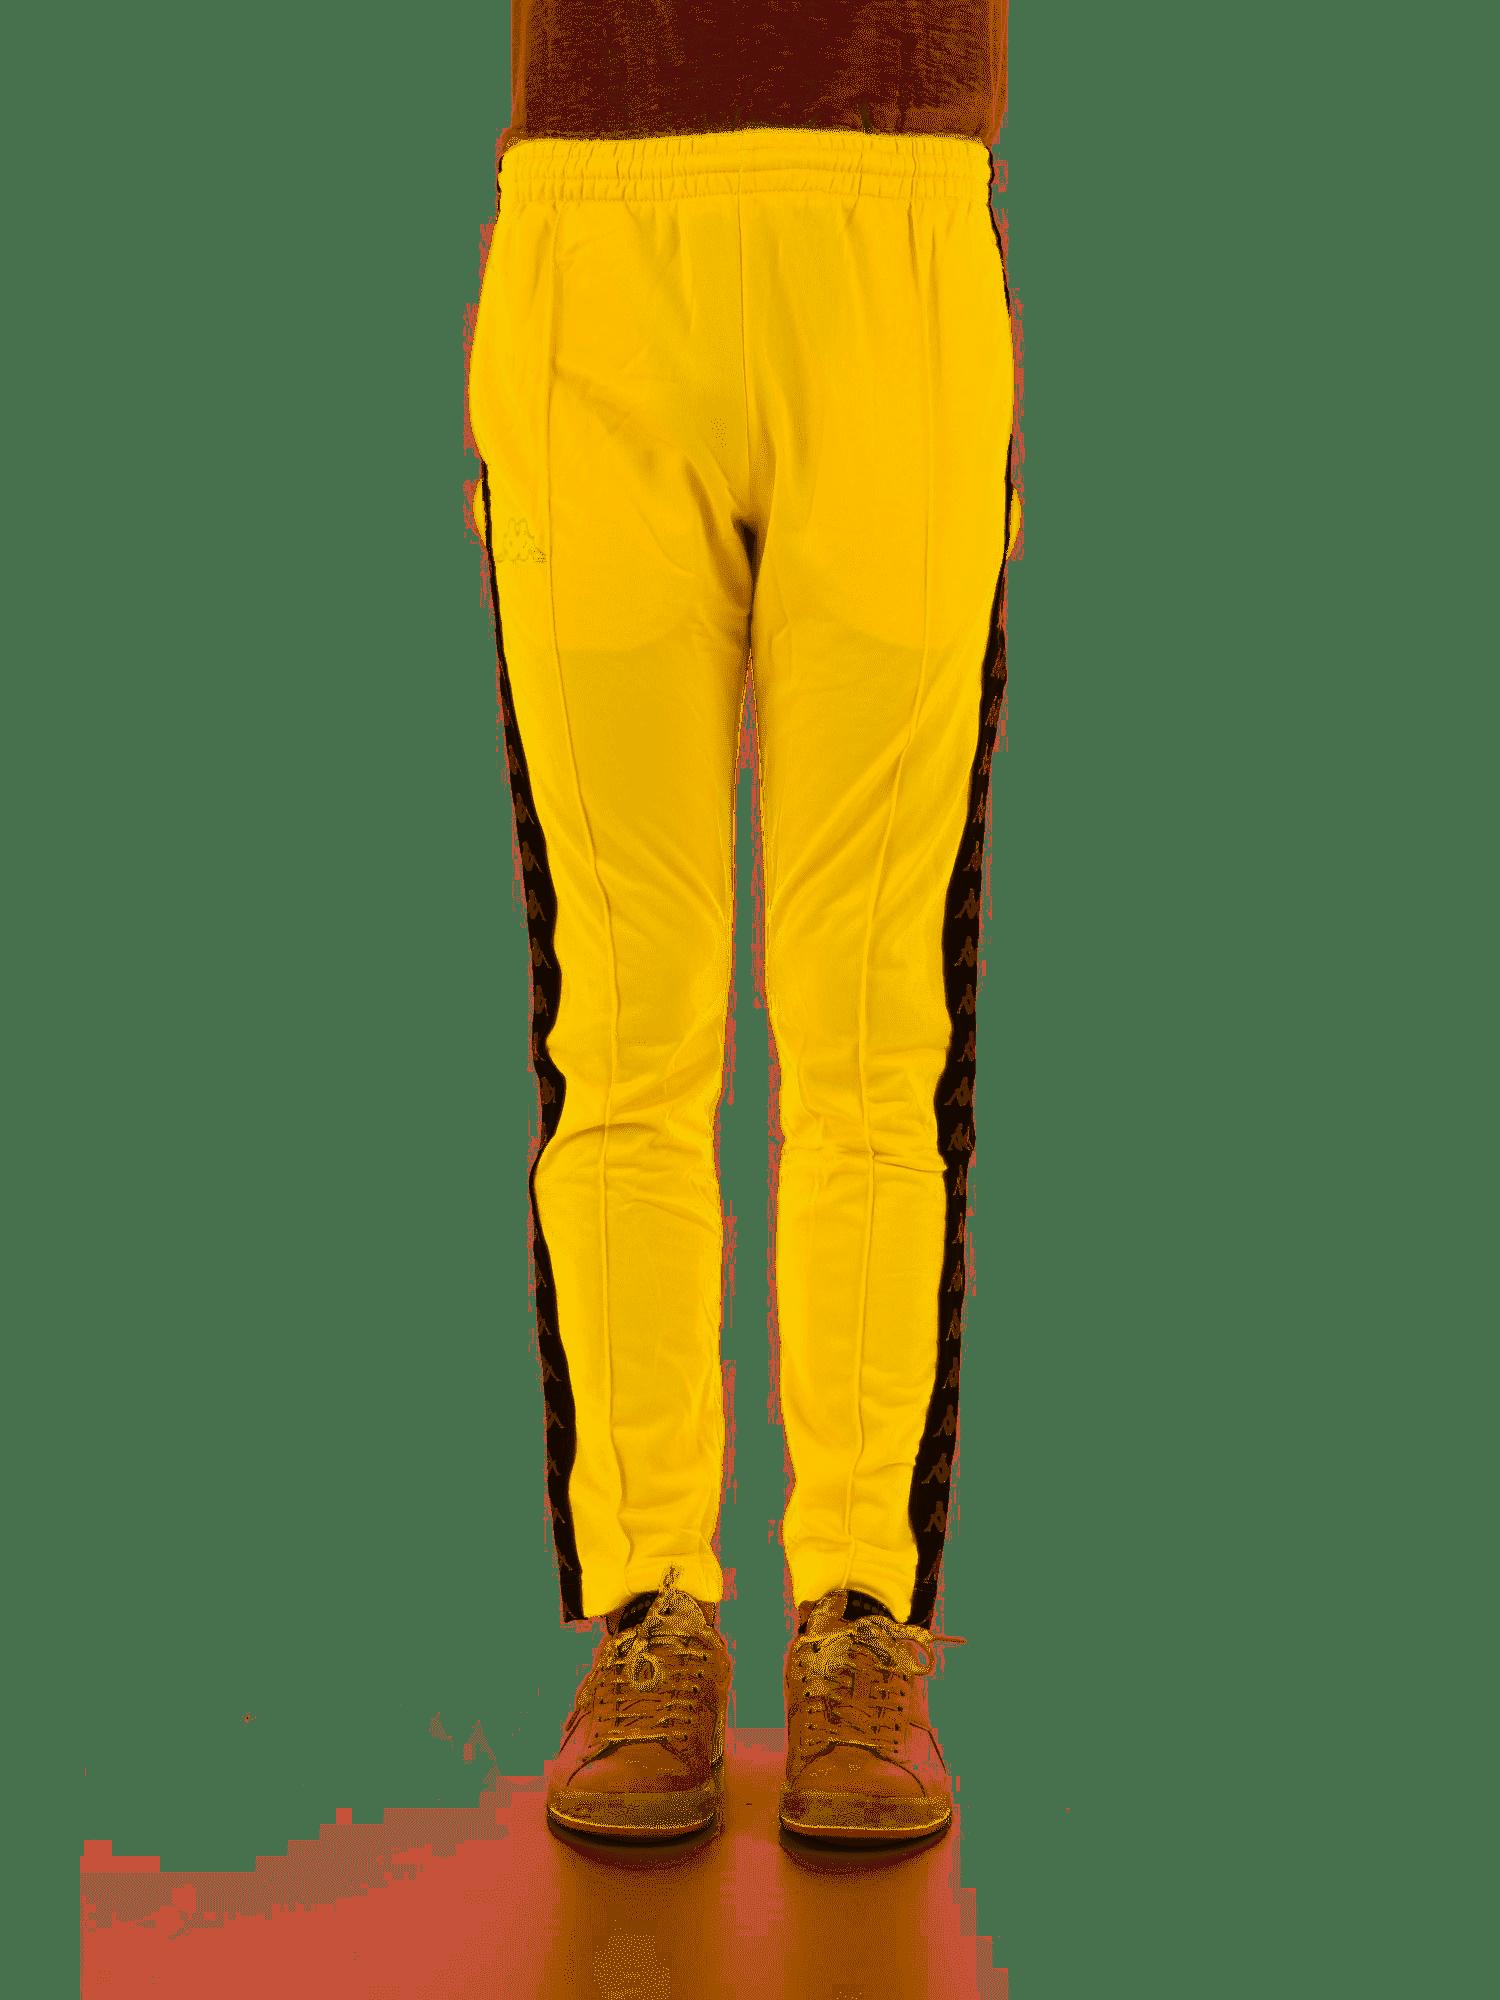 Kappa 222 Banda Astoria Snaps Slim